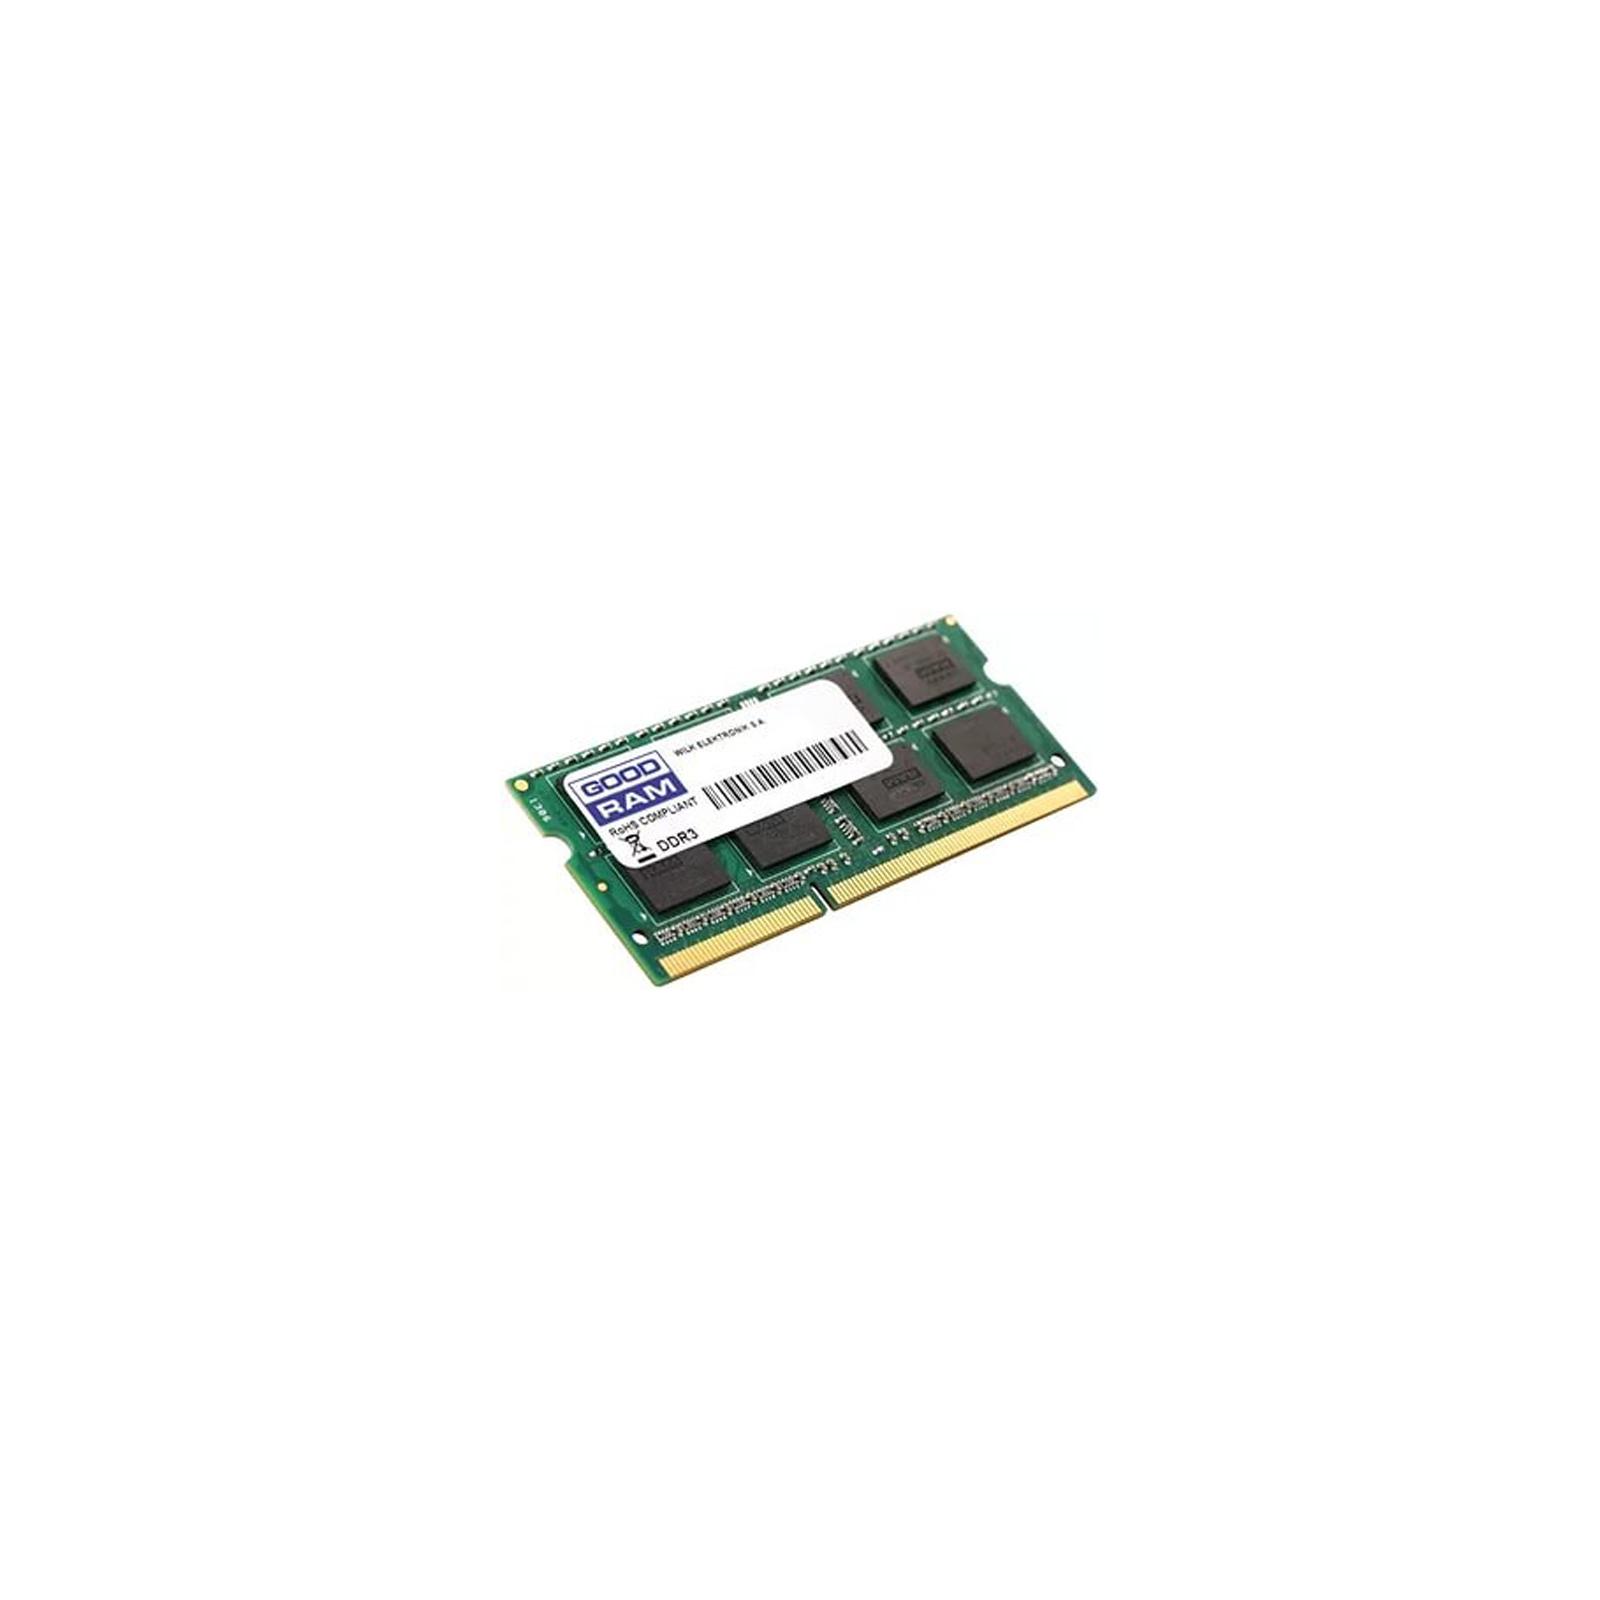 Модуль памяти для ноутбука SoDIMM DDR3 2GB 1600 MHz GOODRAM (GR1600S364L11N/2G) изображение 2